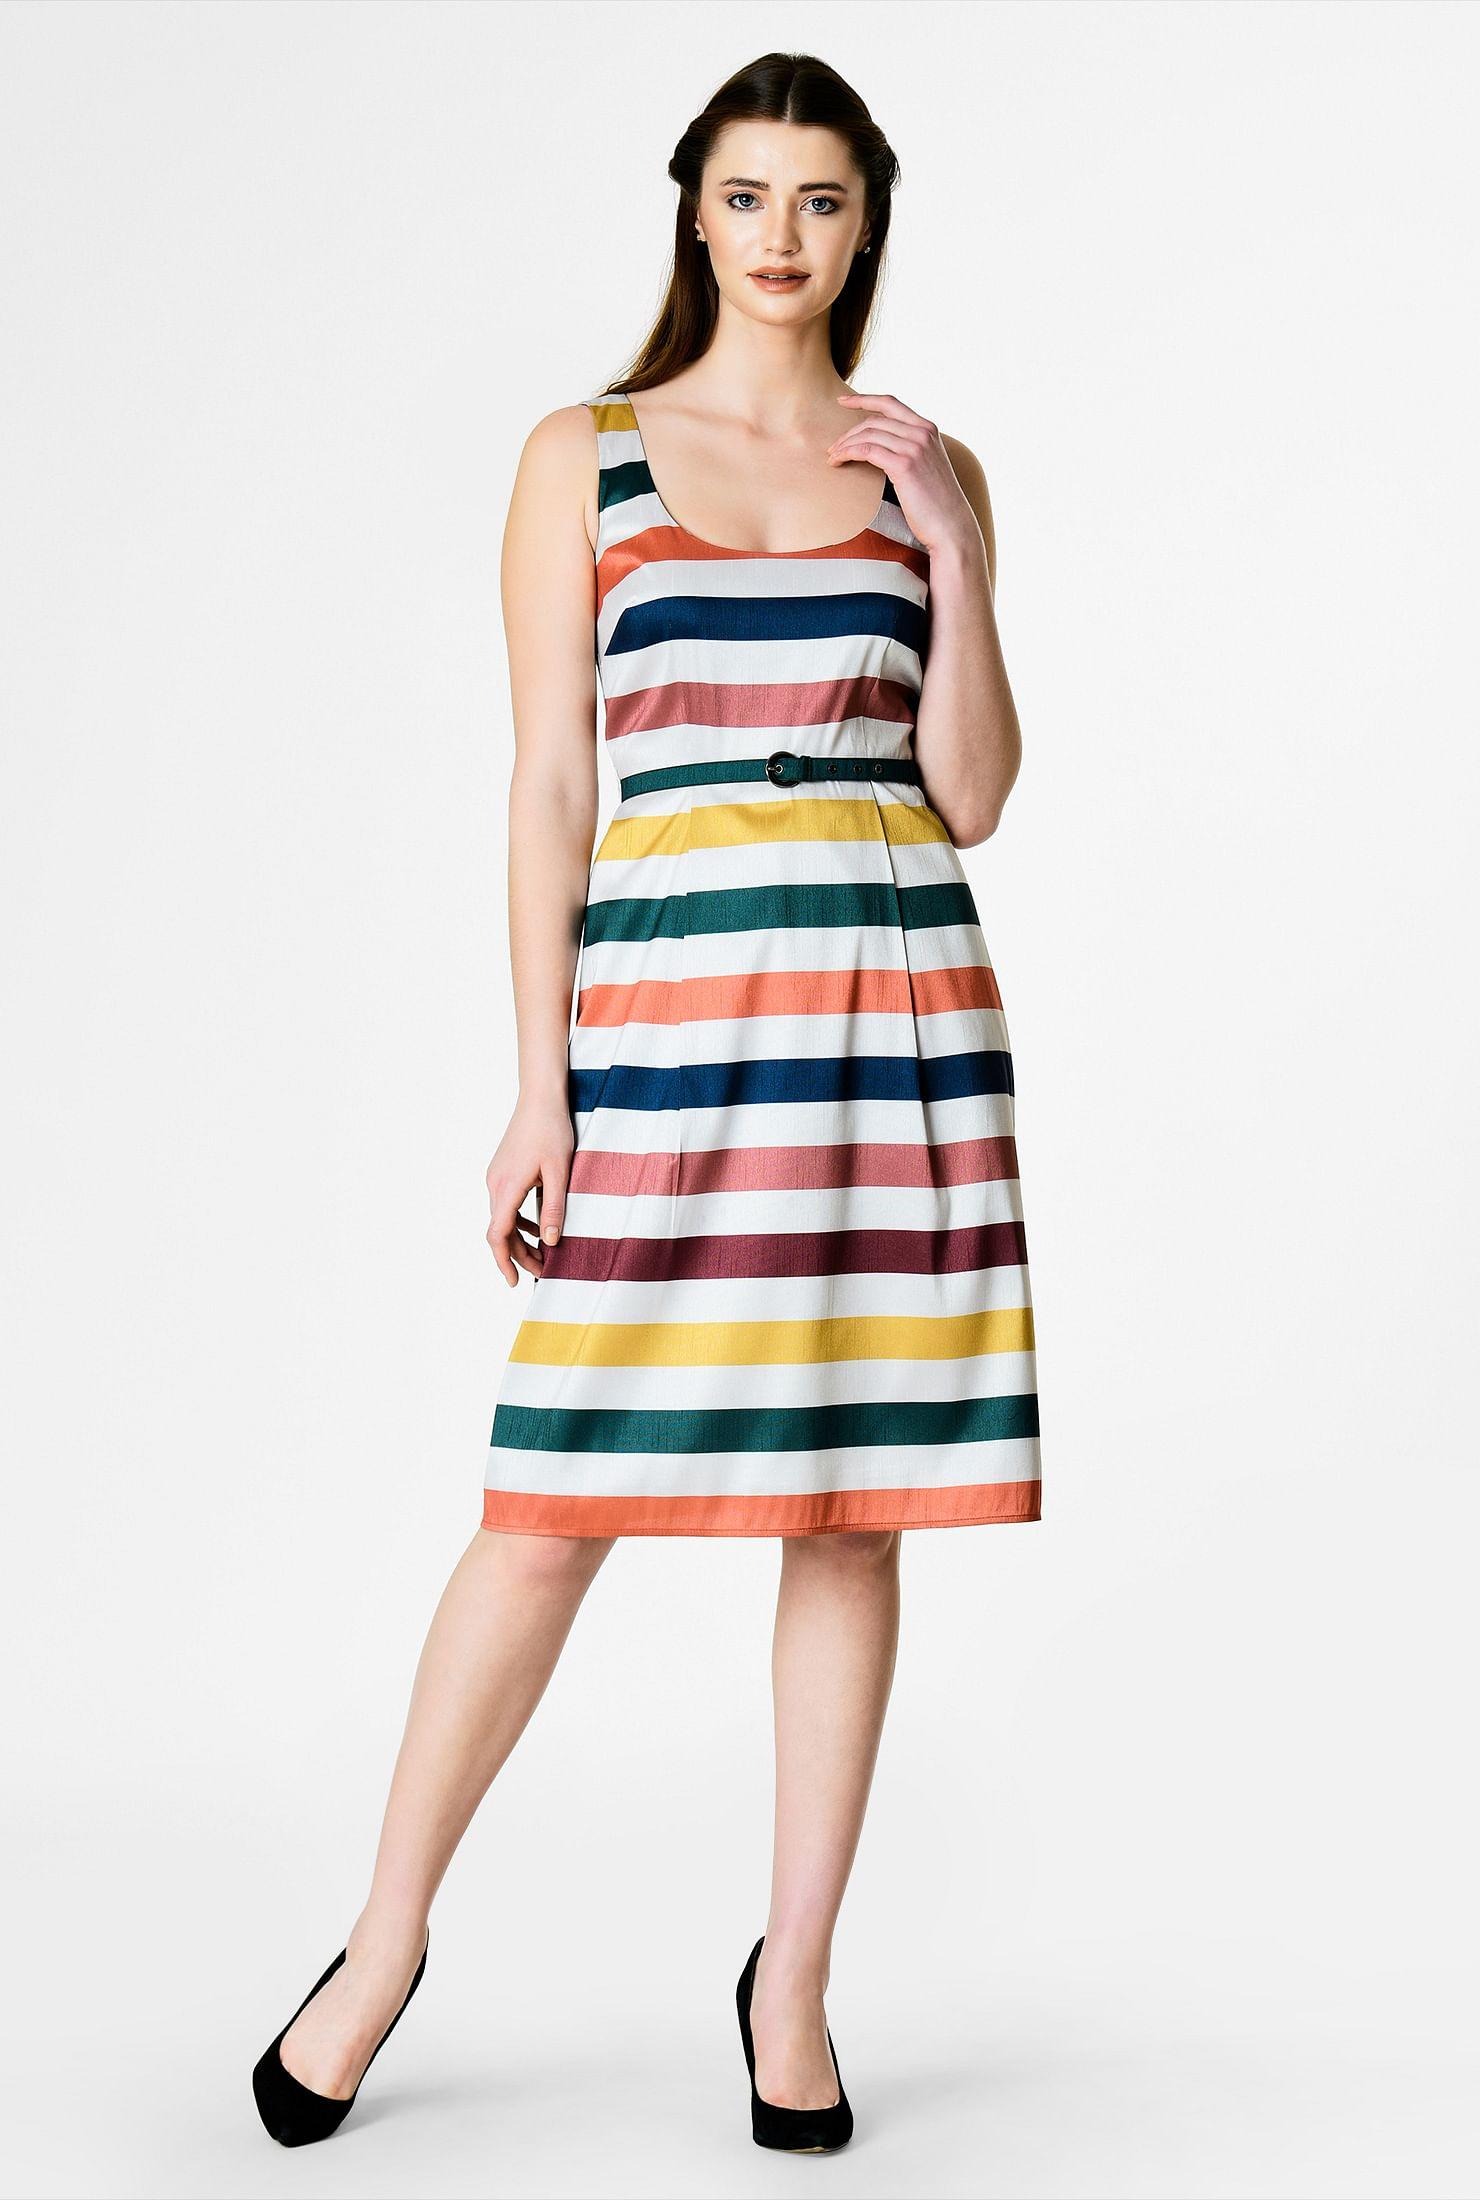 , all-size inclusive dresses, event dresses, petites, plus size dresses, spring Dresses, tall